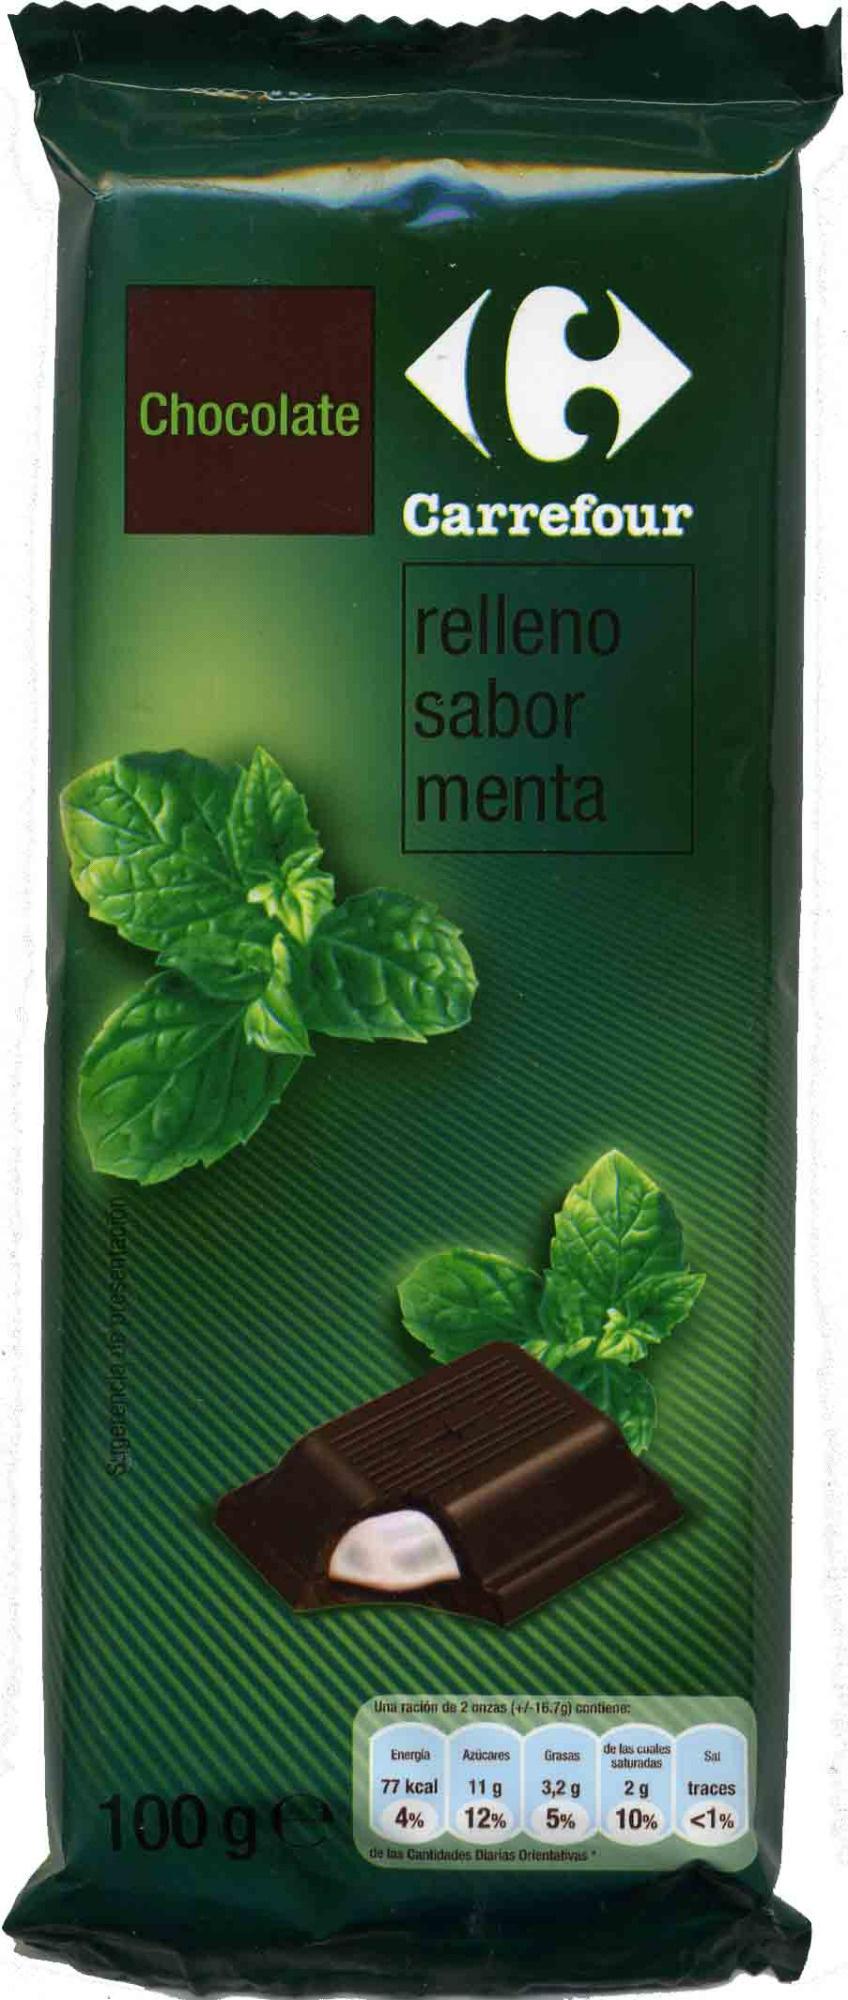 Tableta de chocolate relleno sabor menta carrefour 100 g - Relleno nordico carrefour ...